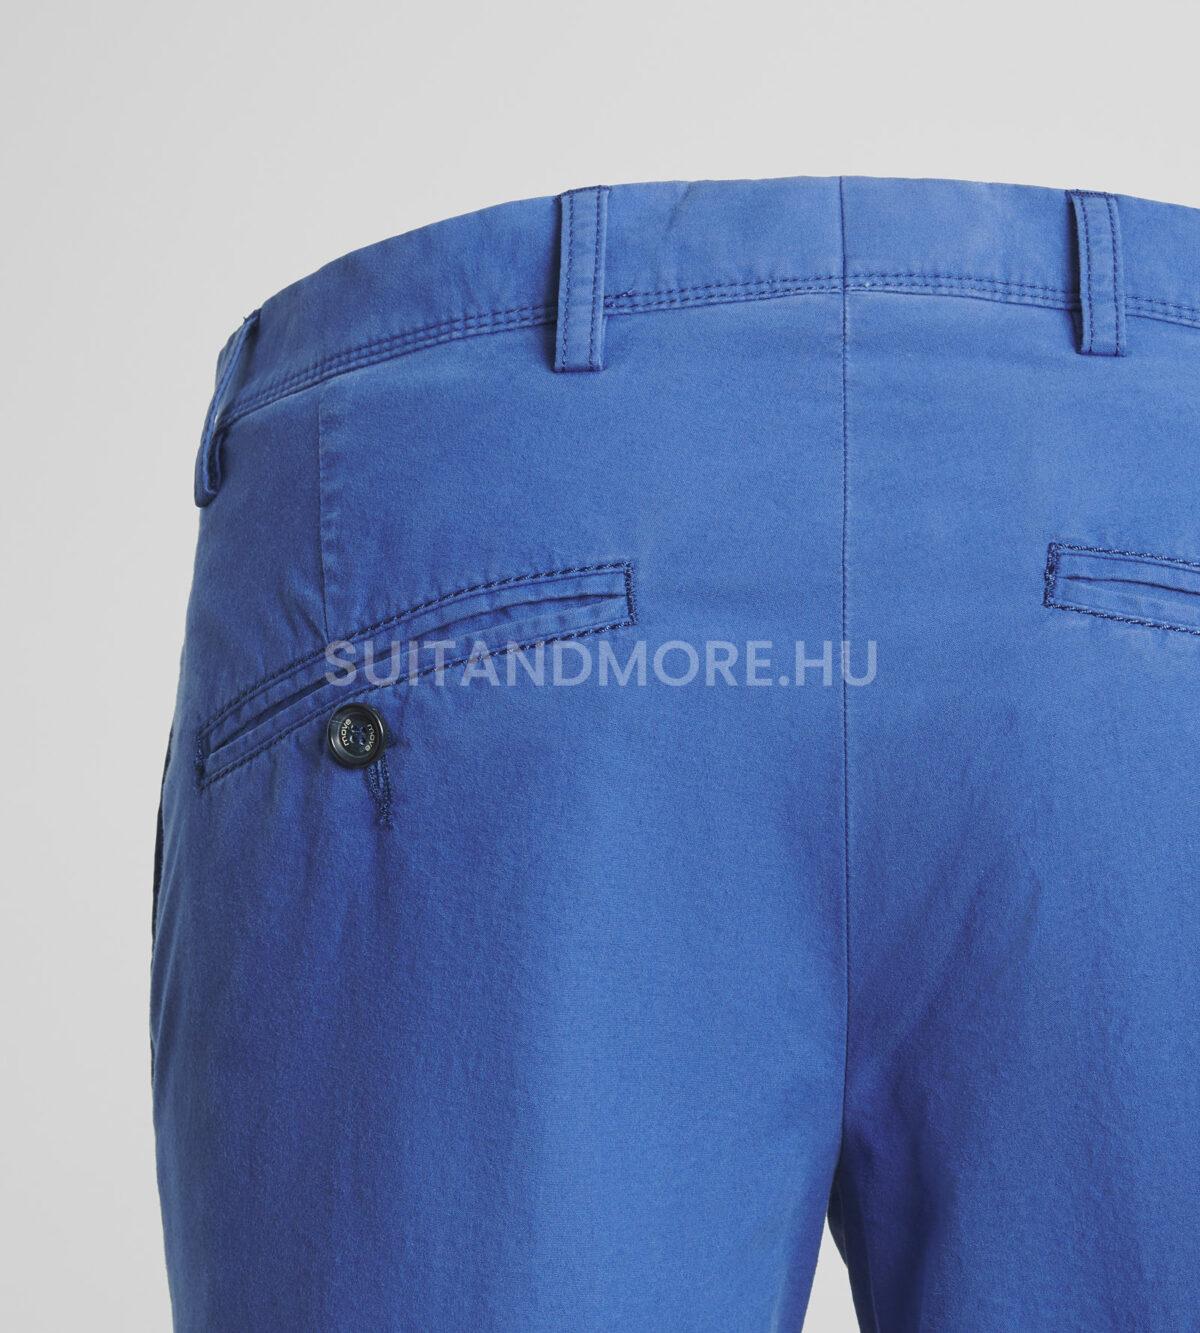 középkék-extra-slim-fit-pamut-sztreccs-chino-nadrág-NIGEL-1181539-24-03